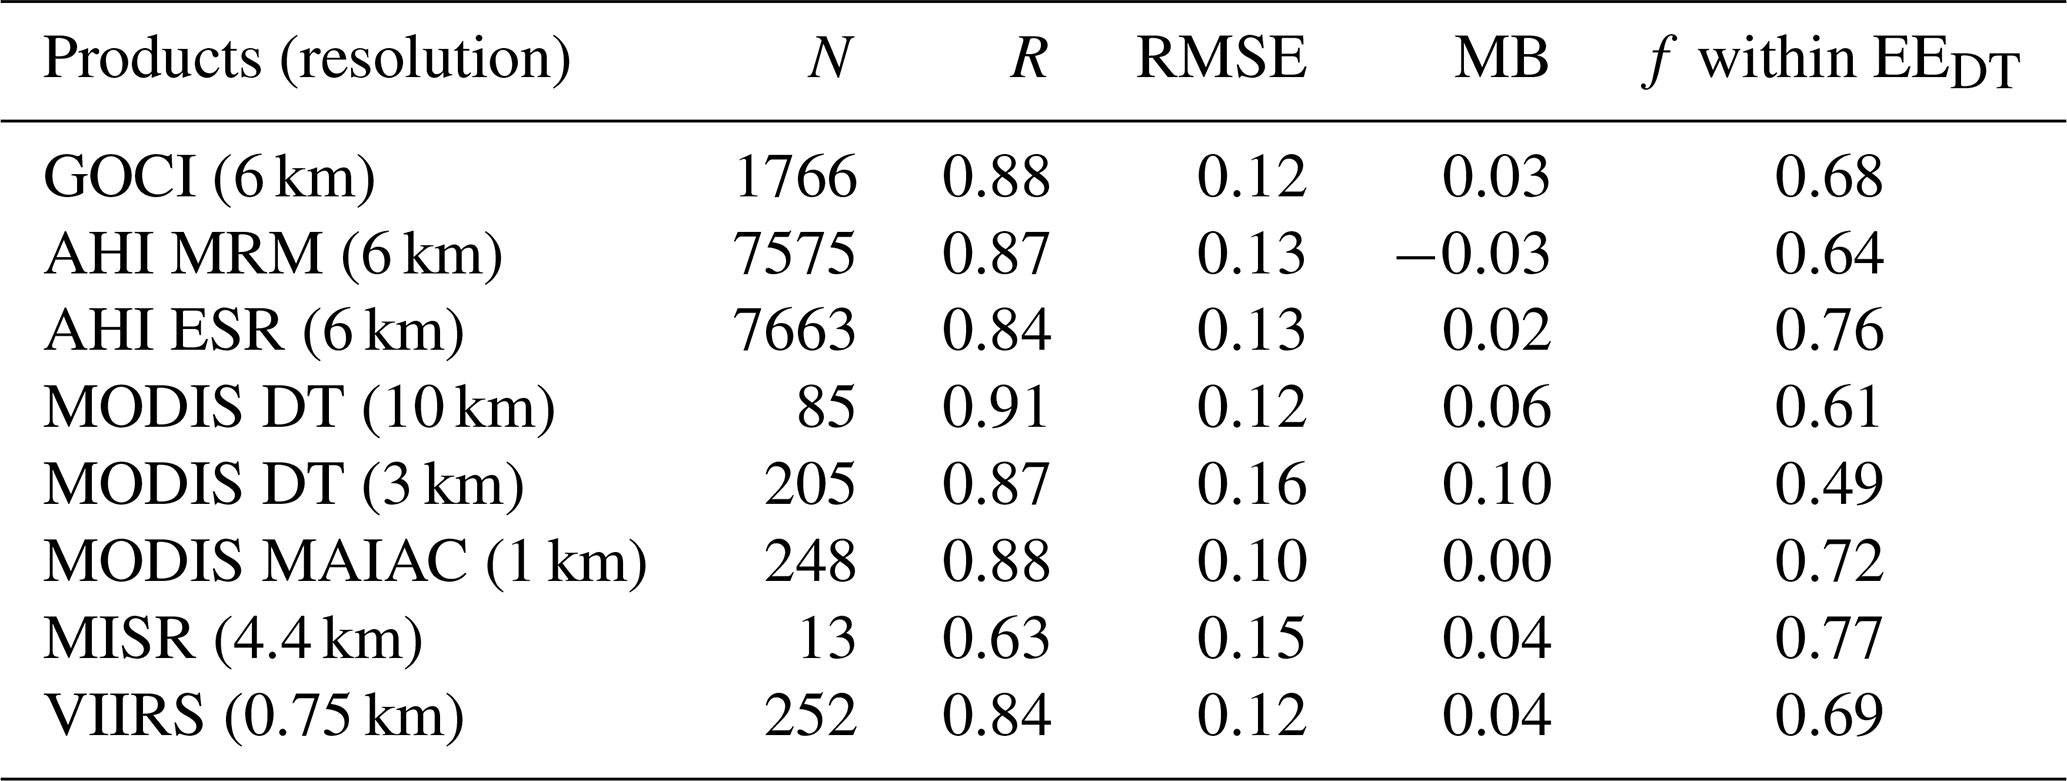 AMT - Validation, comparison, and integration of GOCI, AHI